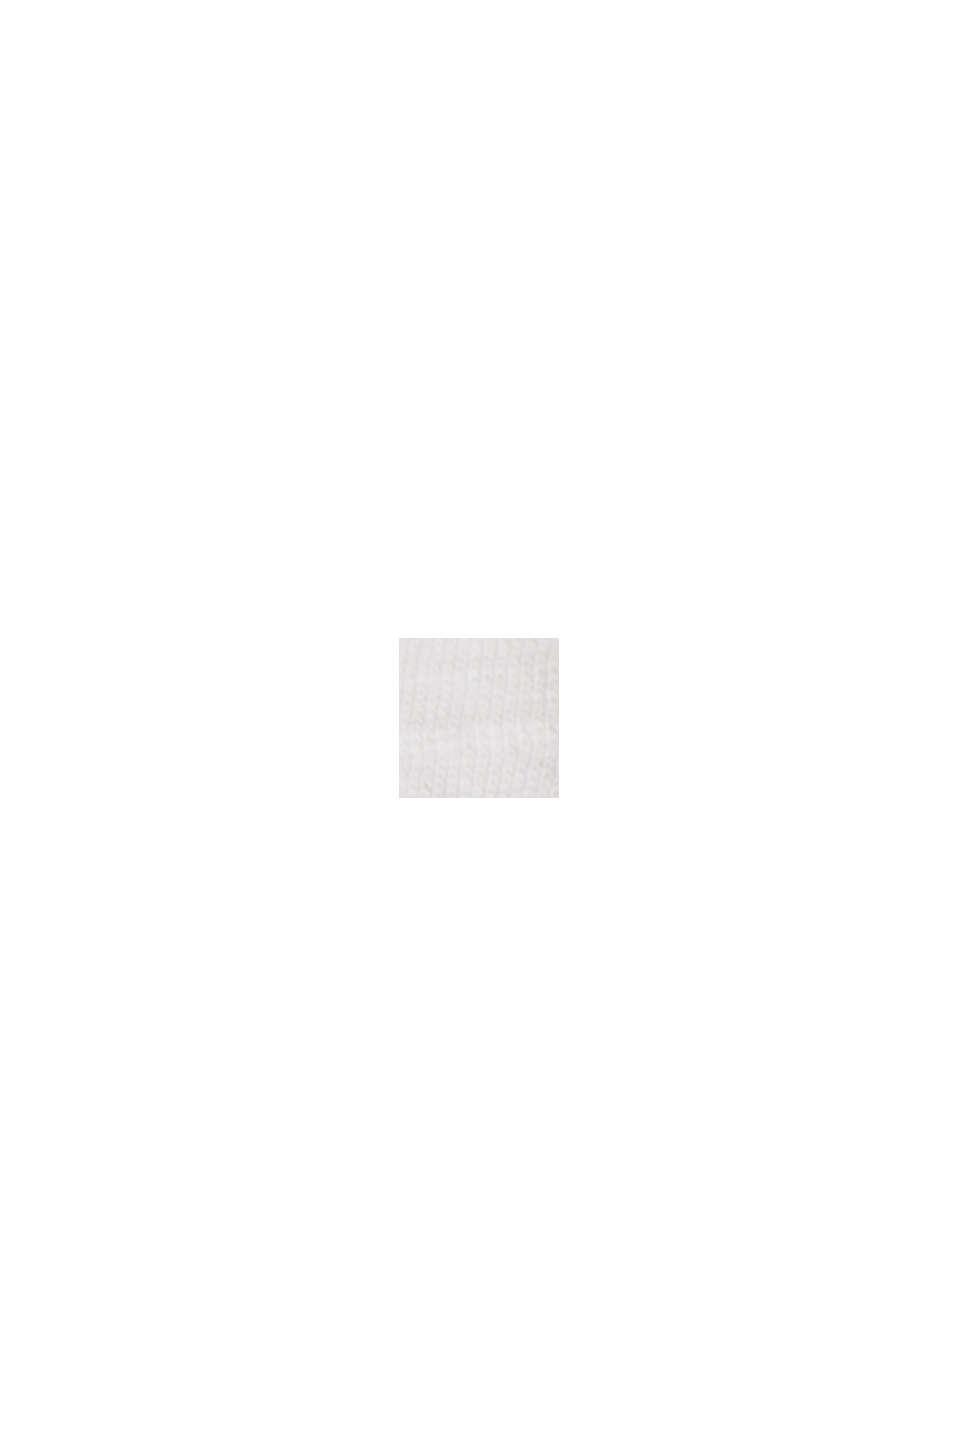 Tanktop met V-hals en gehaakte kant, OFF WHITE, swatch